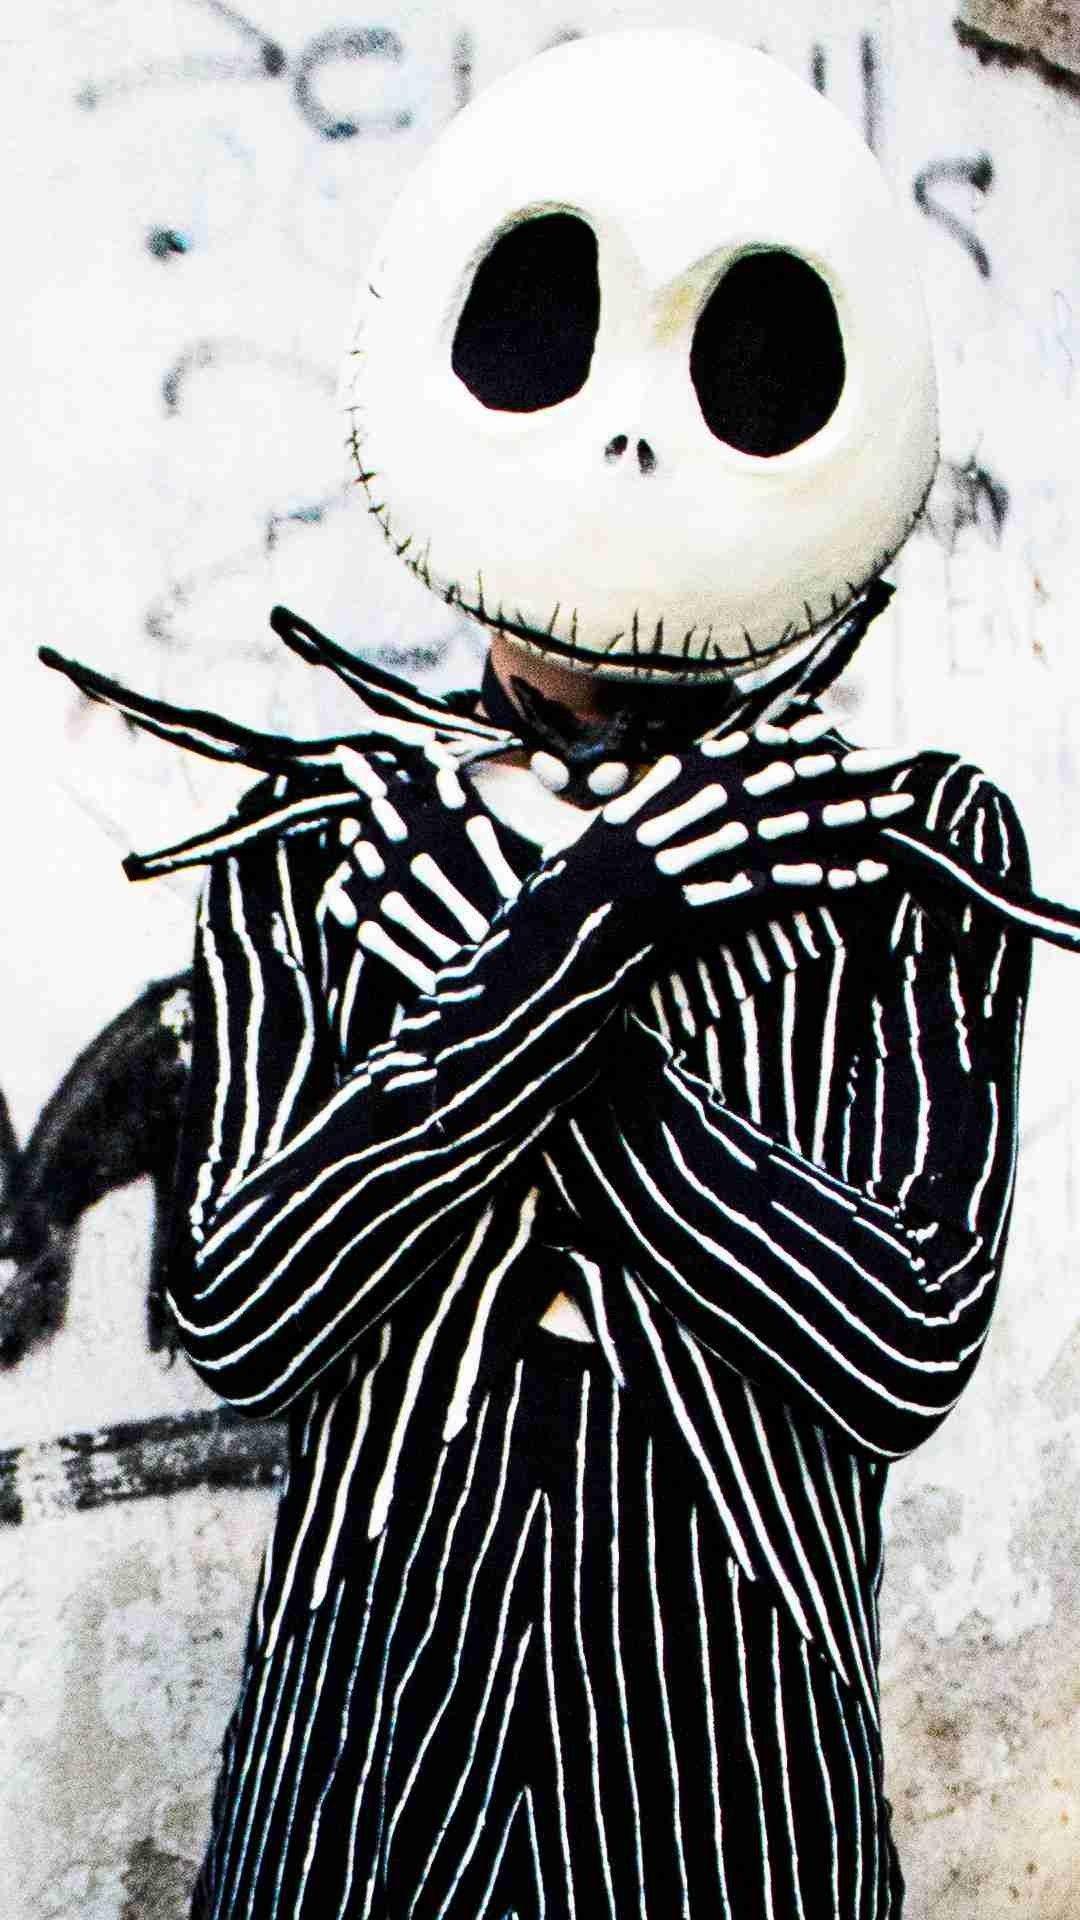 Jack Skellington Costume iPhone 6 Wallpaper for 2014 Halloween